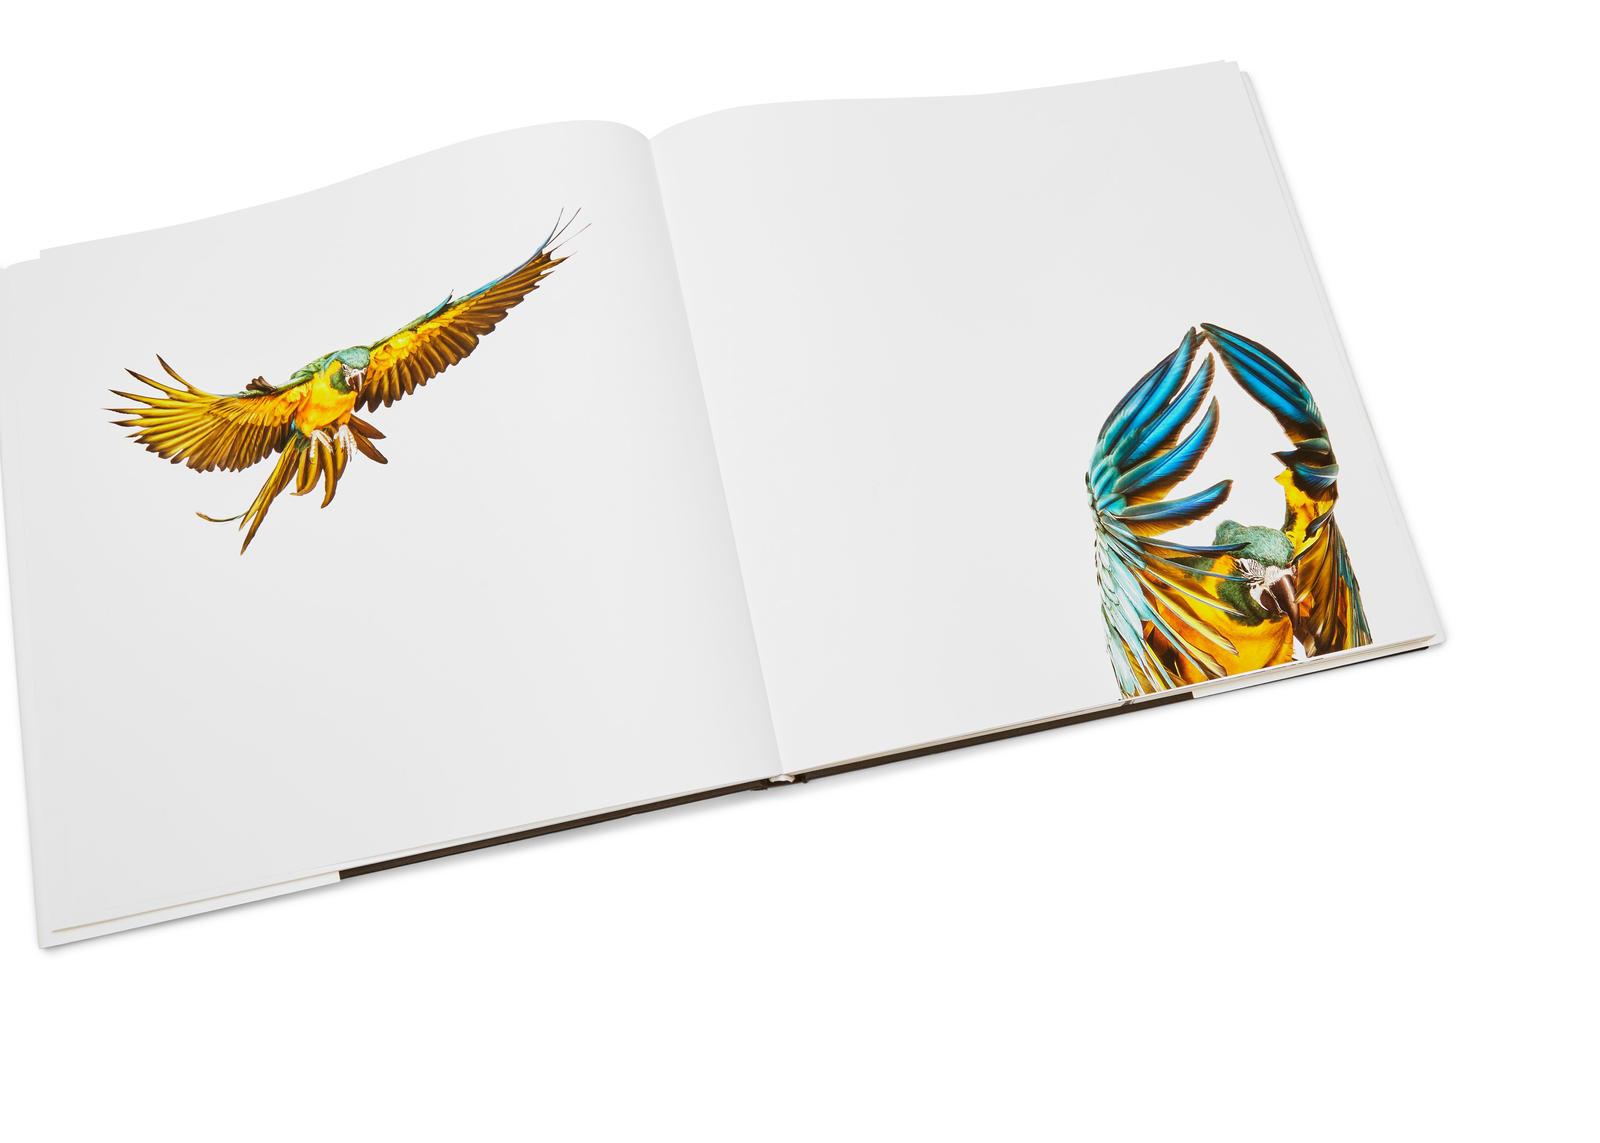 SU16_OLYMPIC_BOOKS_0100_AW1